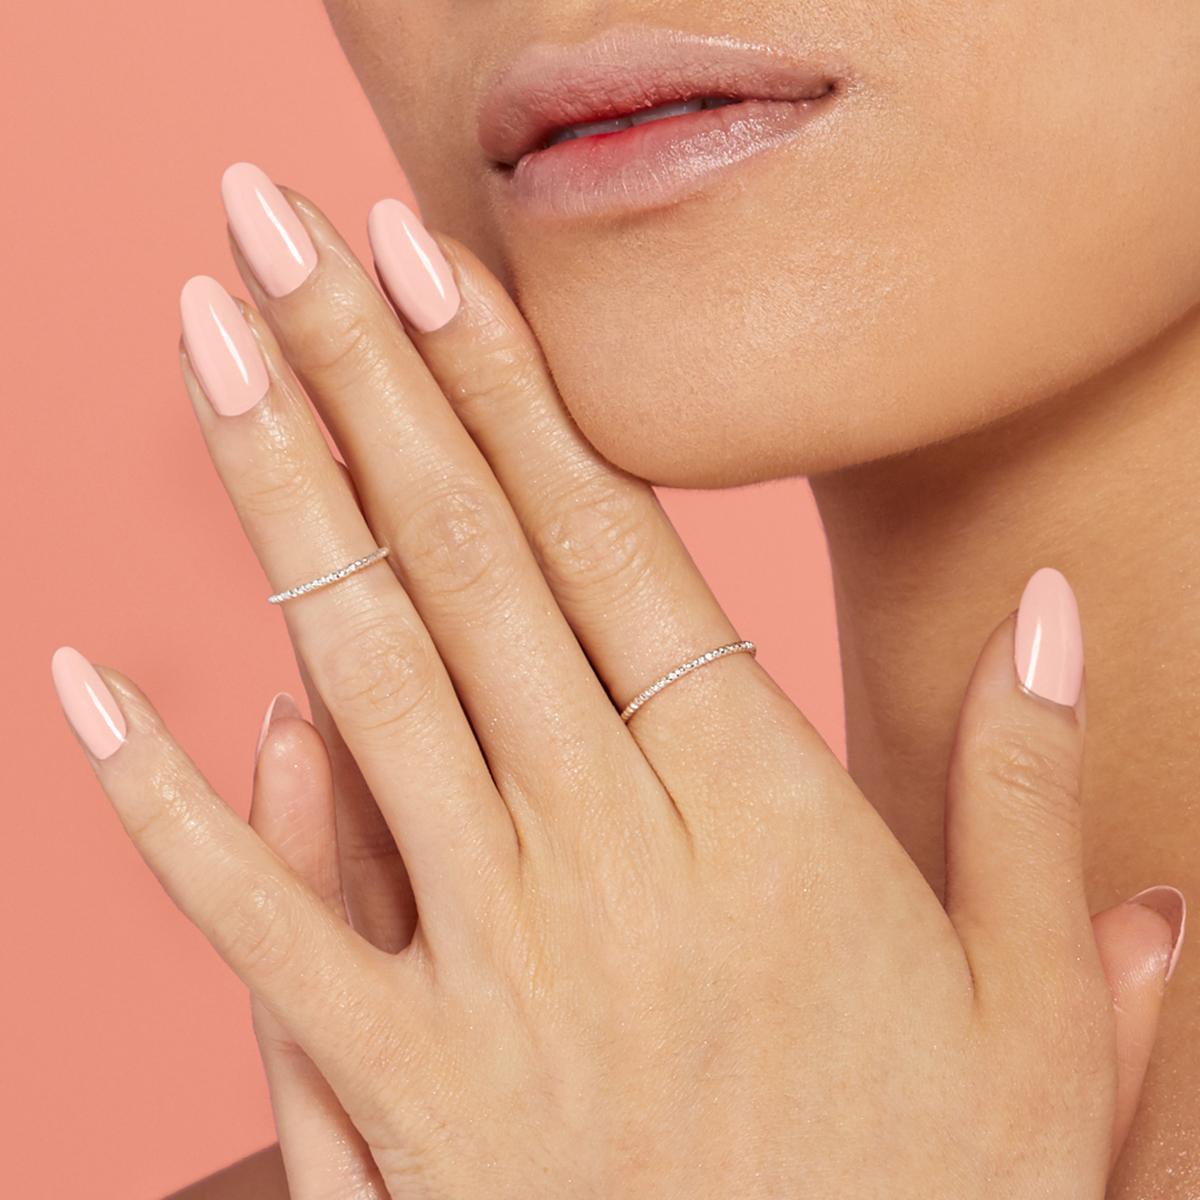 Frau mit lackierten Nägeln